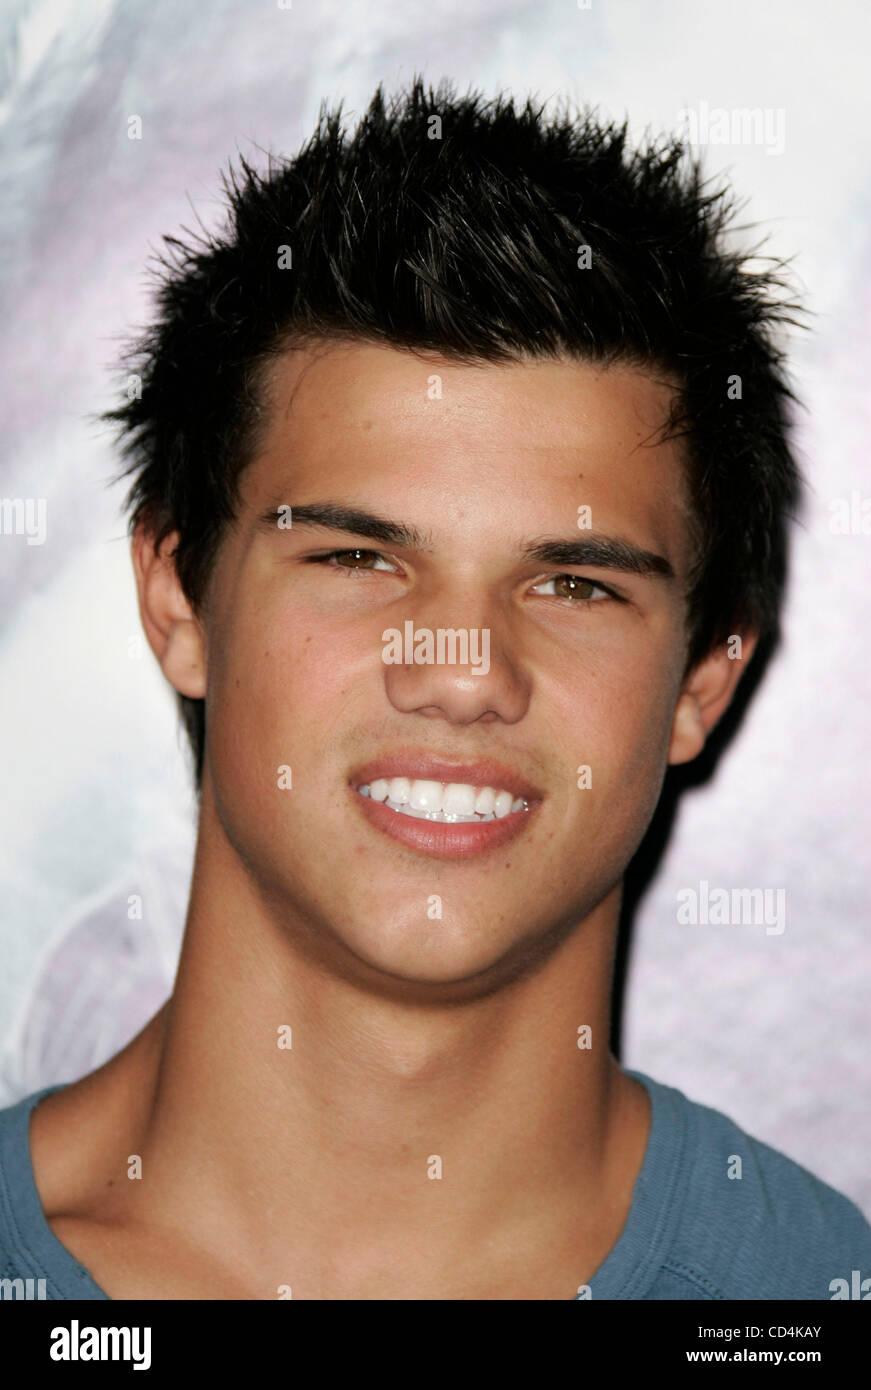 Oct 13, 2008 - Hollywood, California, USA - Actor TAYLOR ...